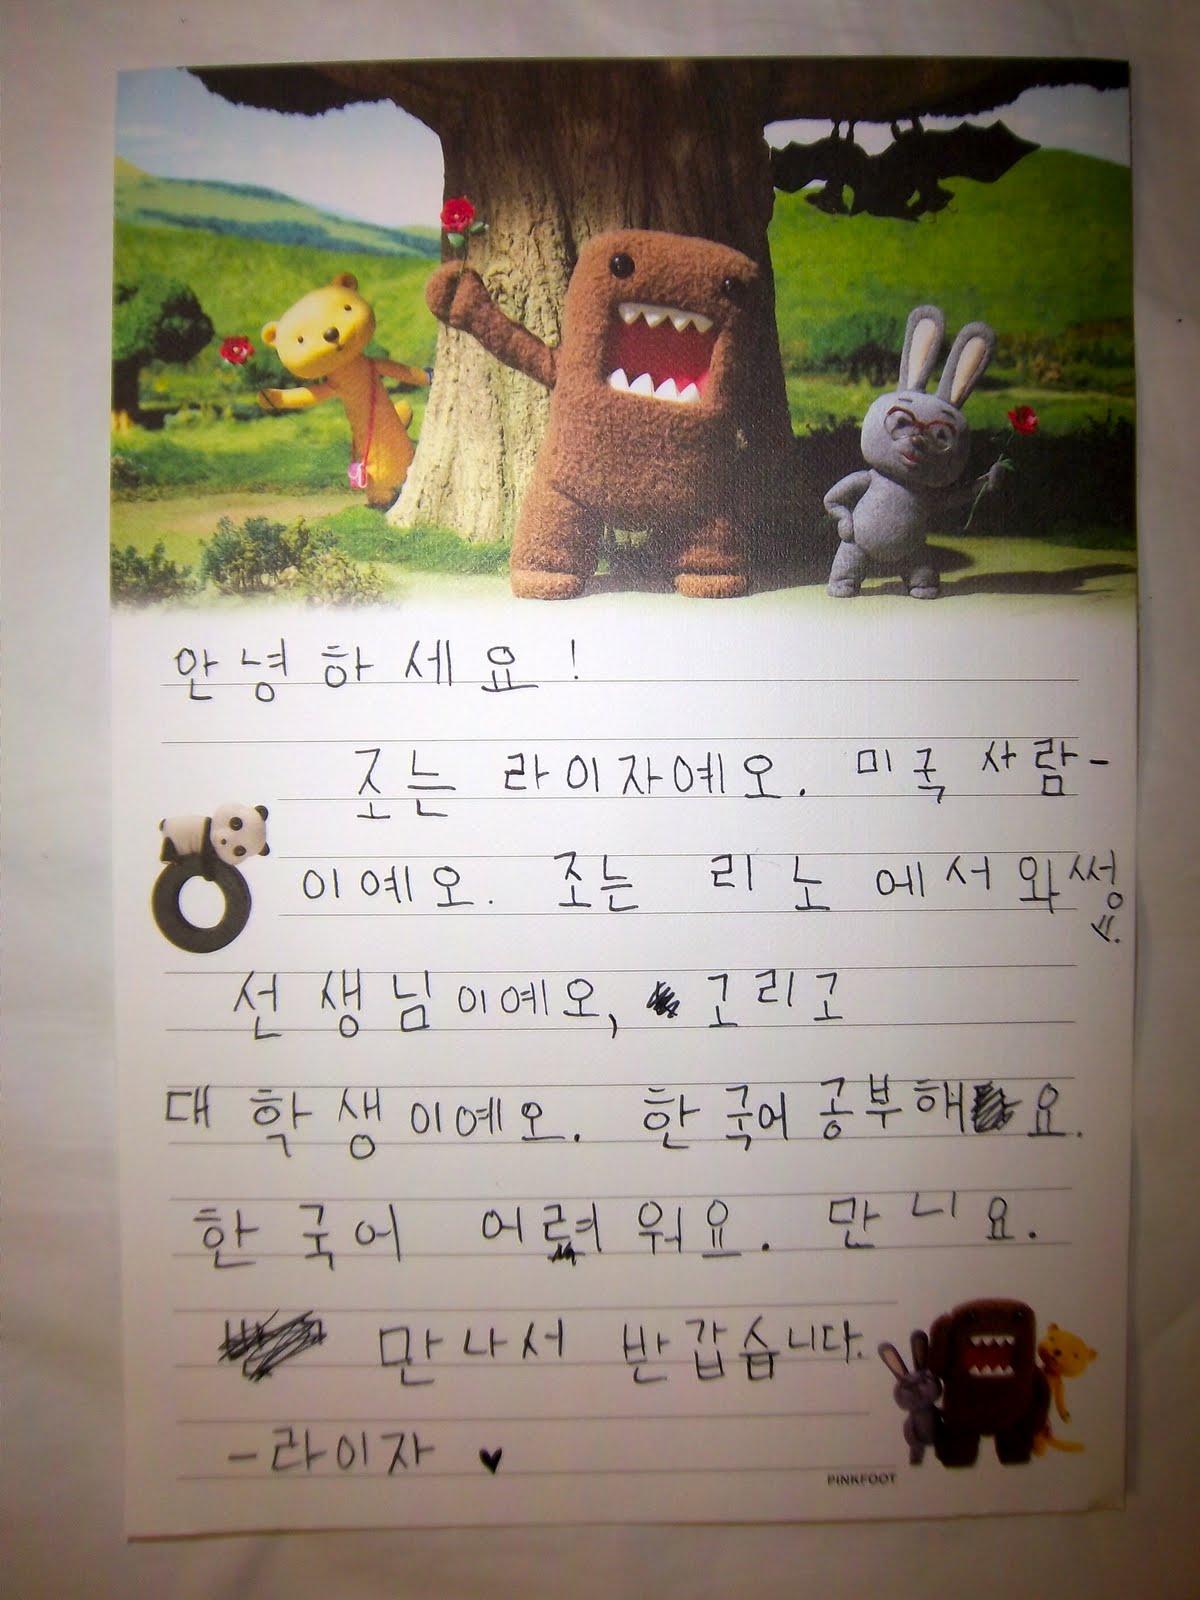 006 Korean Essay 100 0669 Jpg Stirring Examples About Myself Contest Full